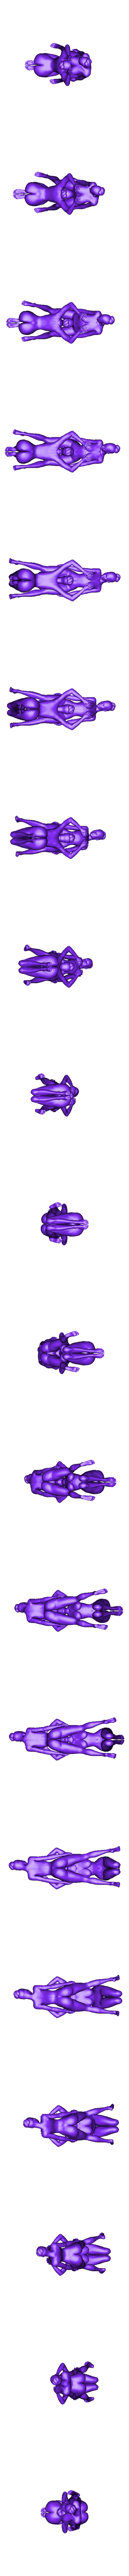 Pleasure time.stl Download free STL file Pleasure time • 3D printer object, nsfw3dmodel